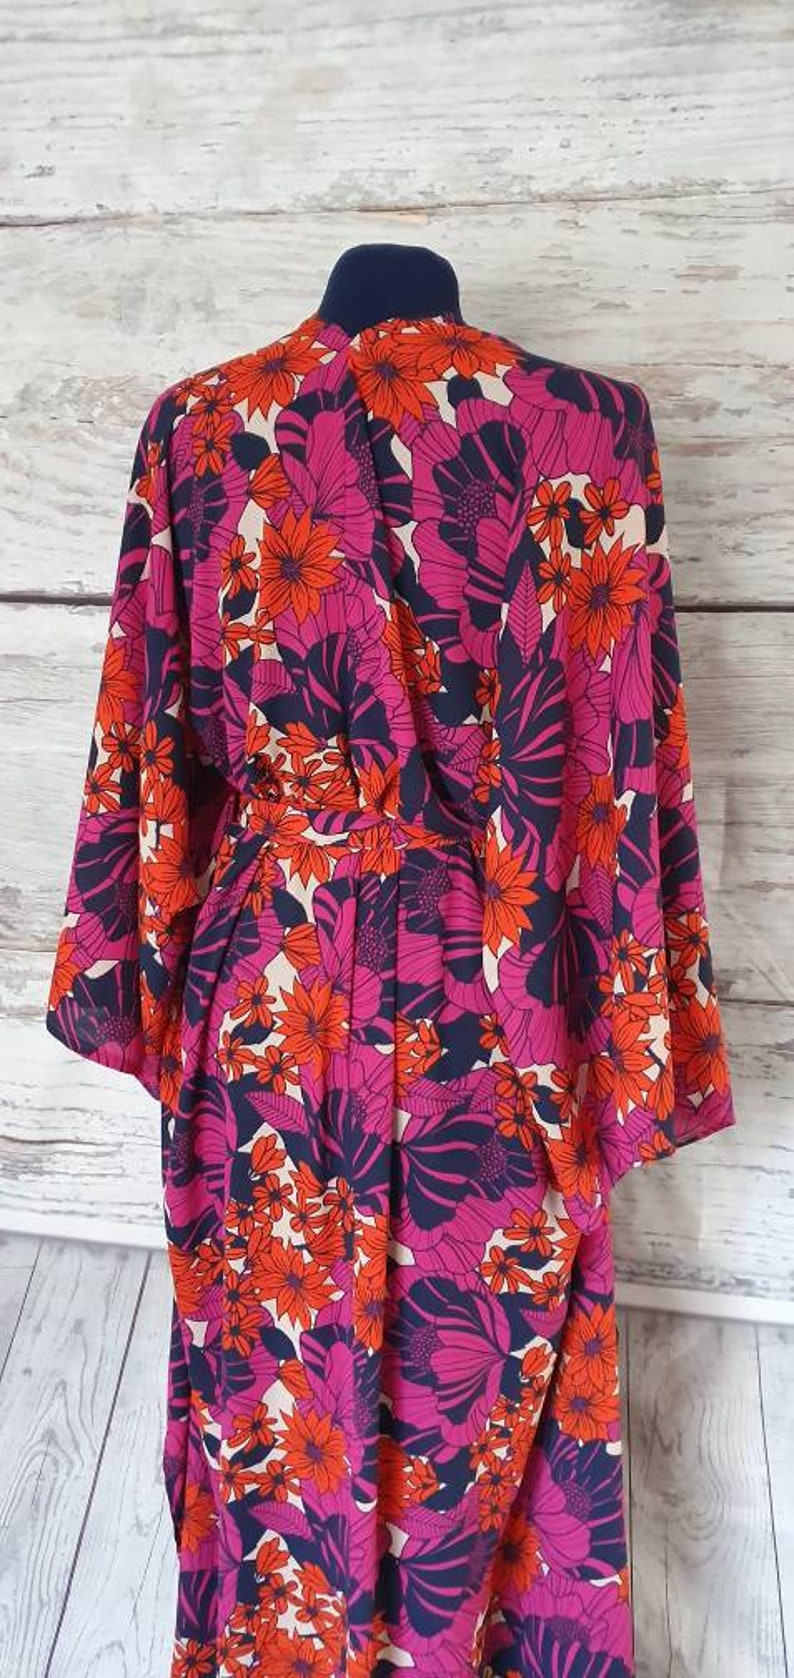 70s Dress Kimono dress Wrap Beach wear Kaftan dress Beach cover-up Kimono Kaftan Maxi Dress Kimono Wrap dress orange Maxi pink